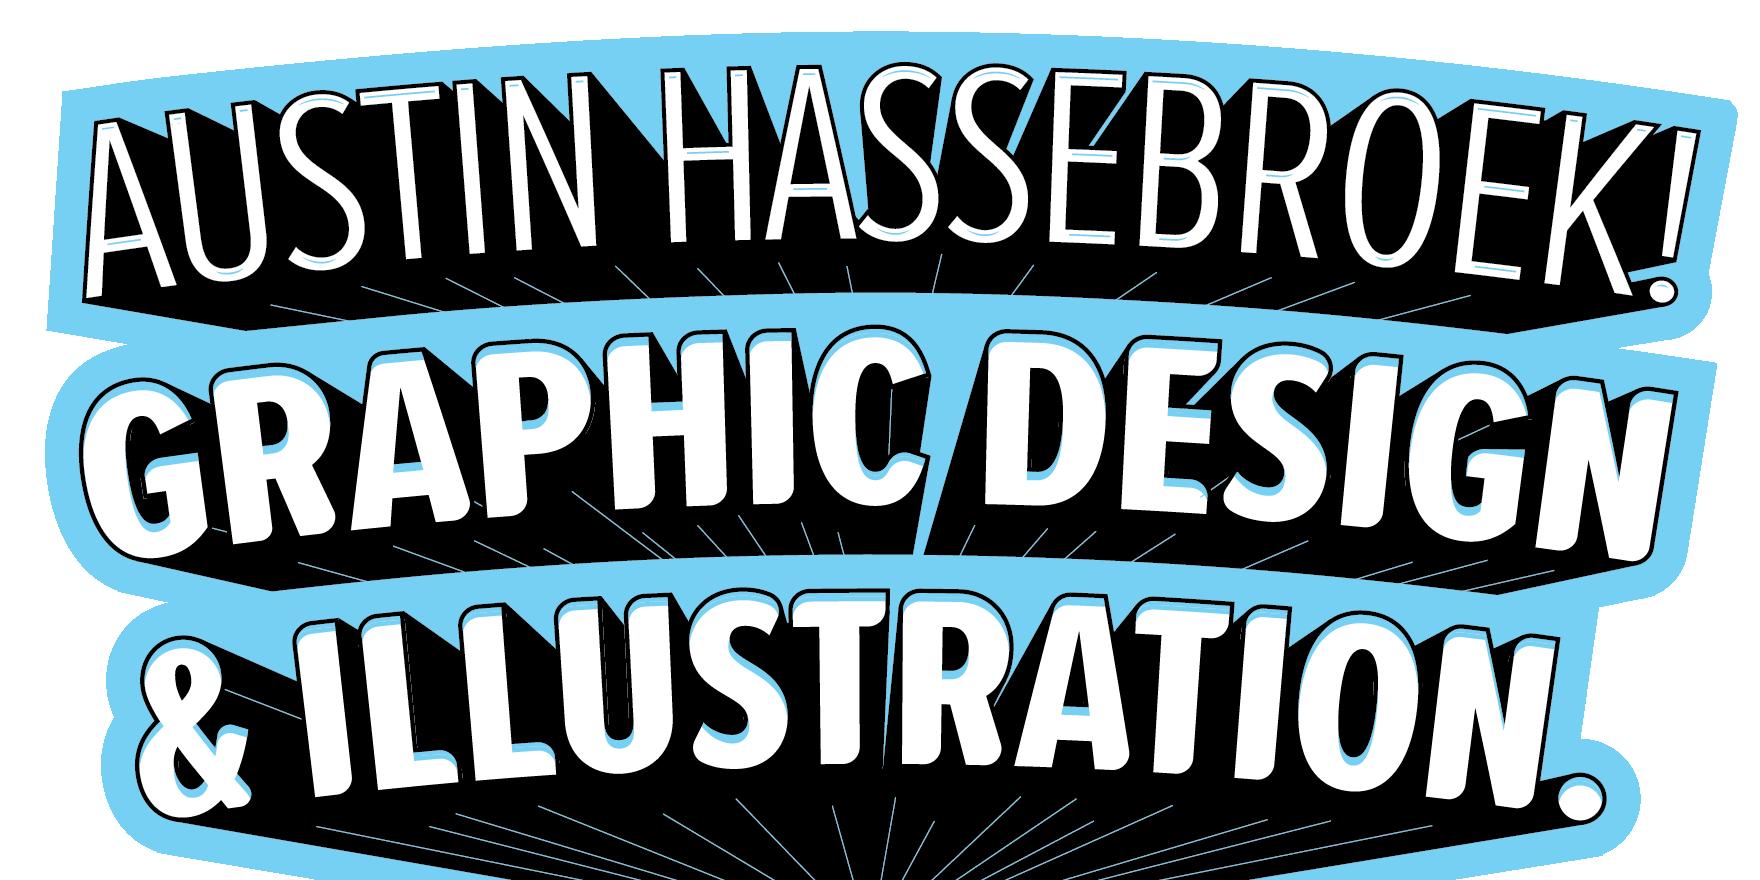 Austin Hassebroek